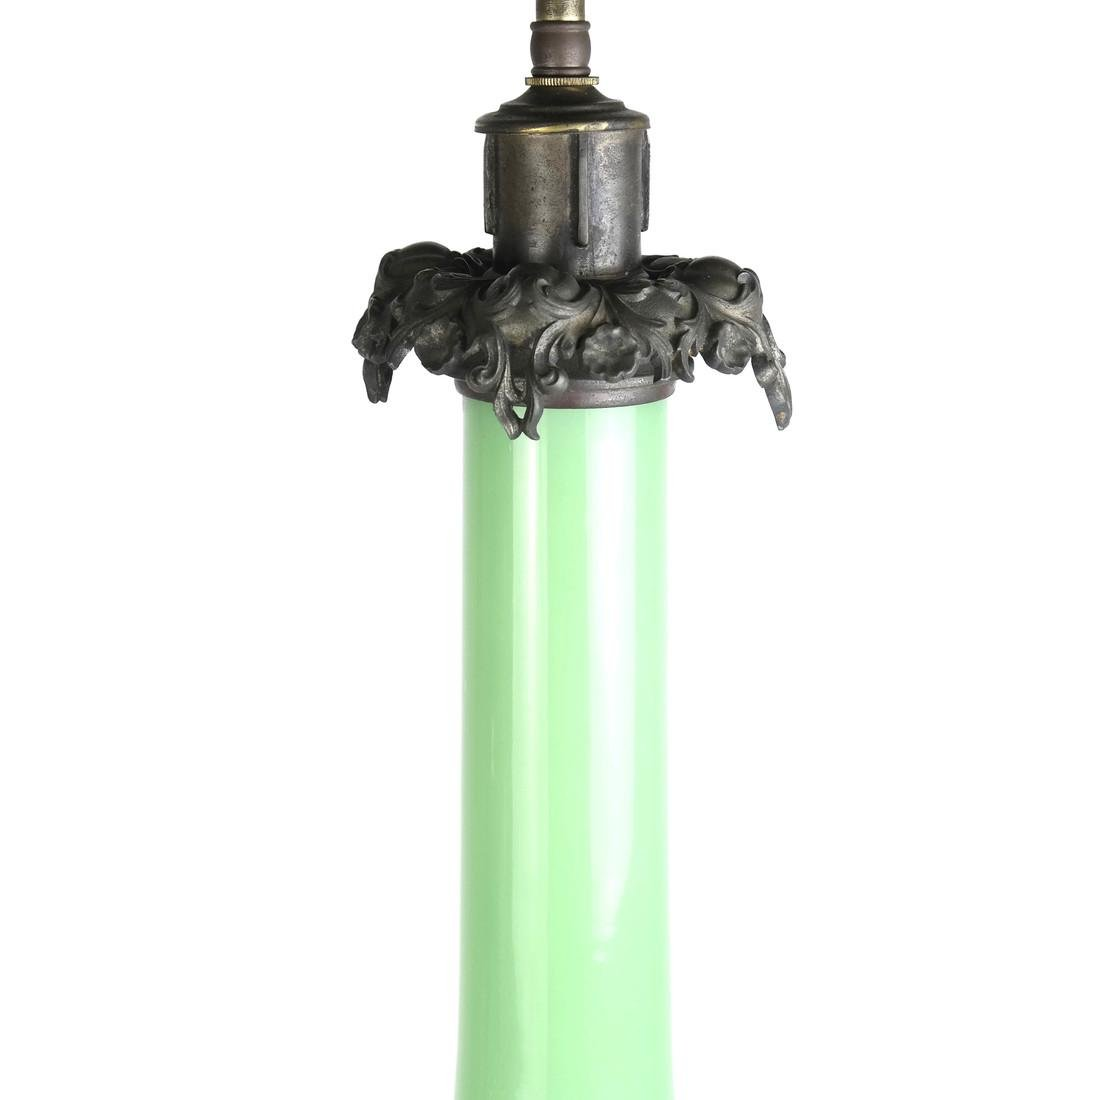 Green Opaline Lamp - 3